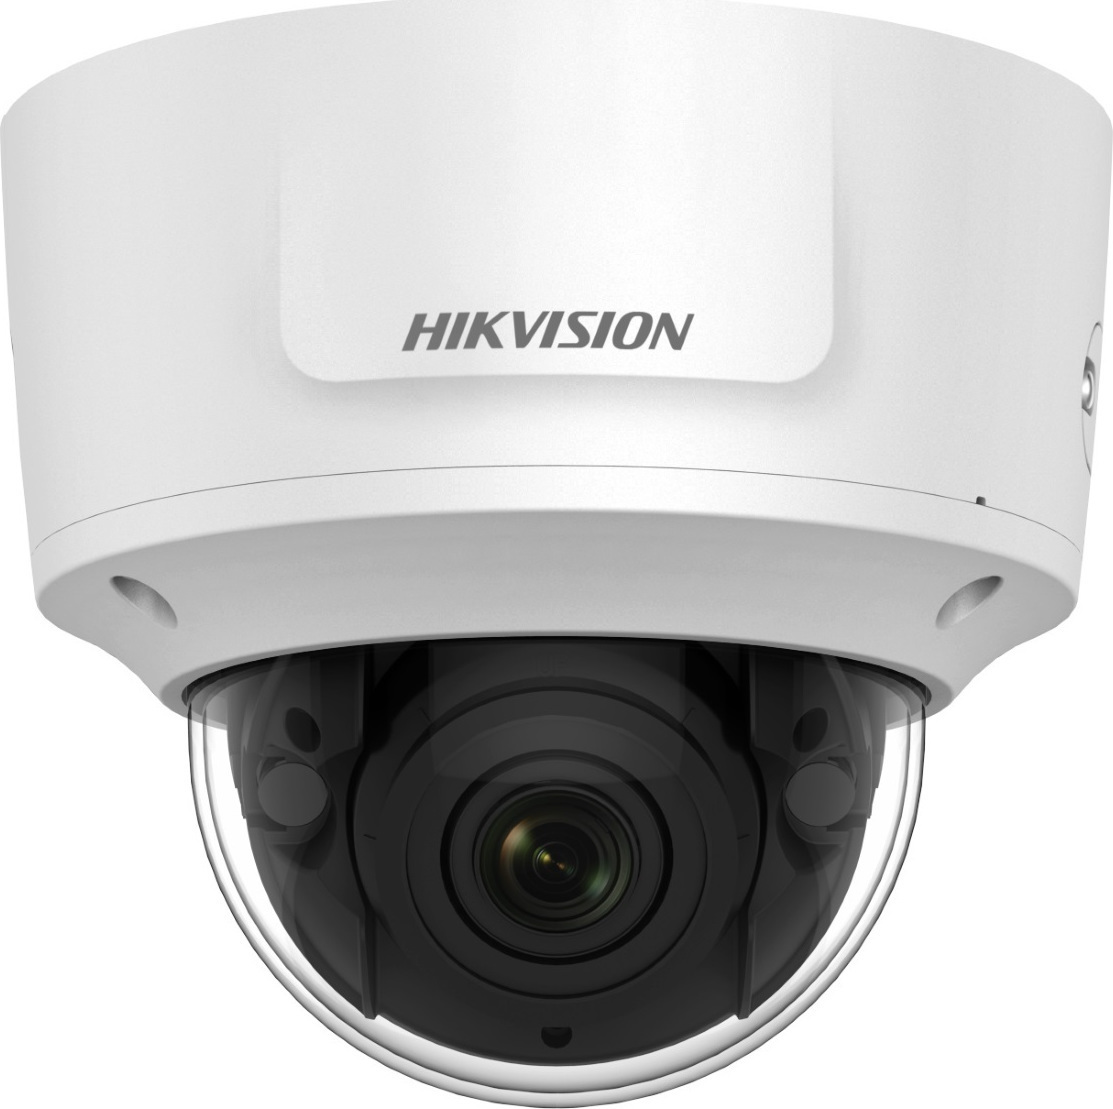 HIKVISION DS-2CD2745FWD-IZS (2.8-12mm)